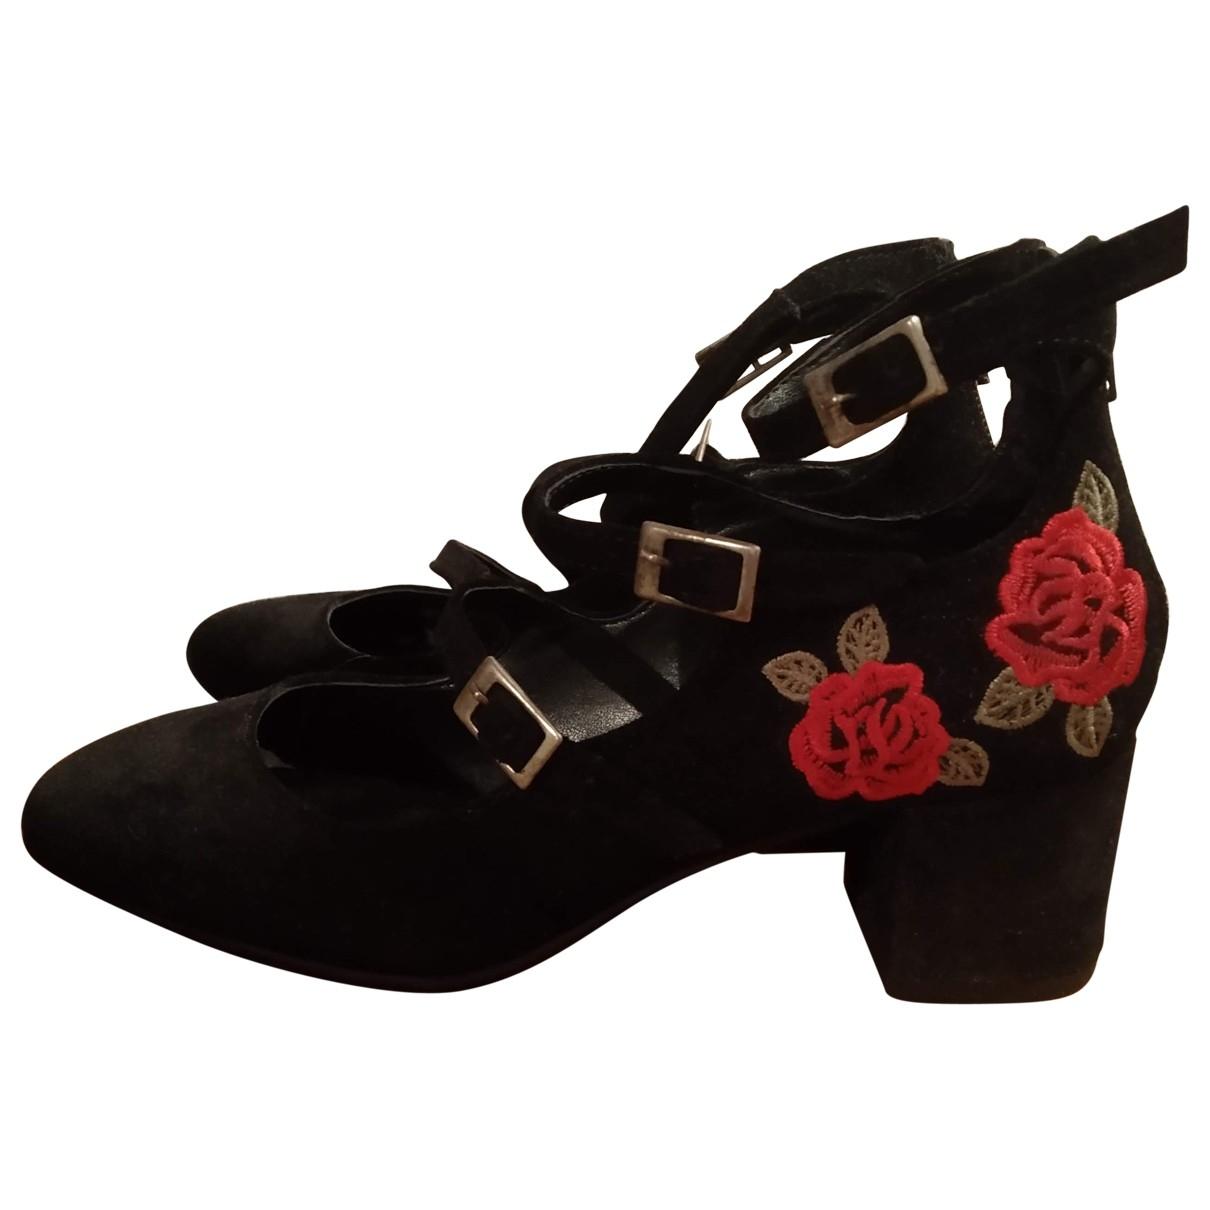 Steve Madden \N Black Suede Heels for Women 6.5 US